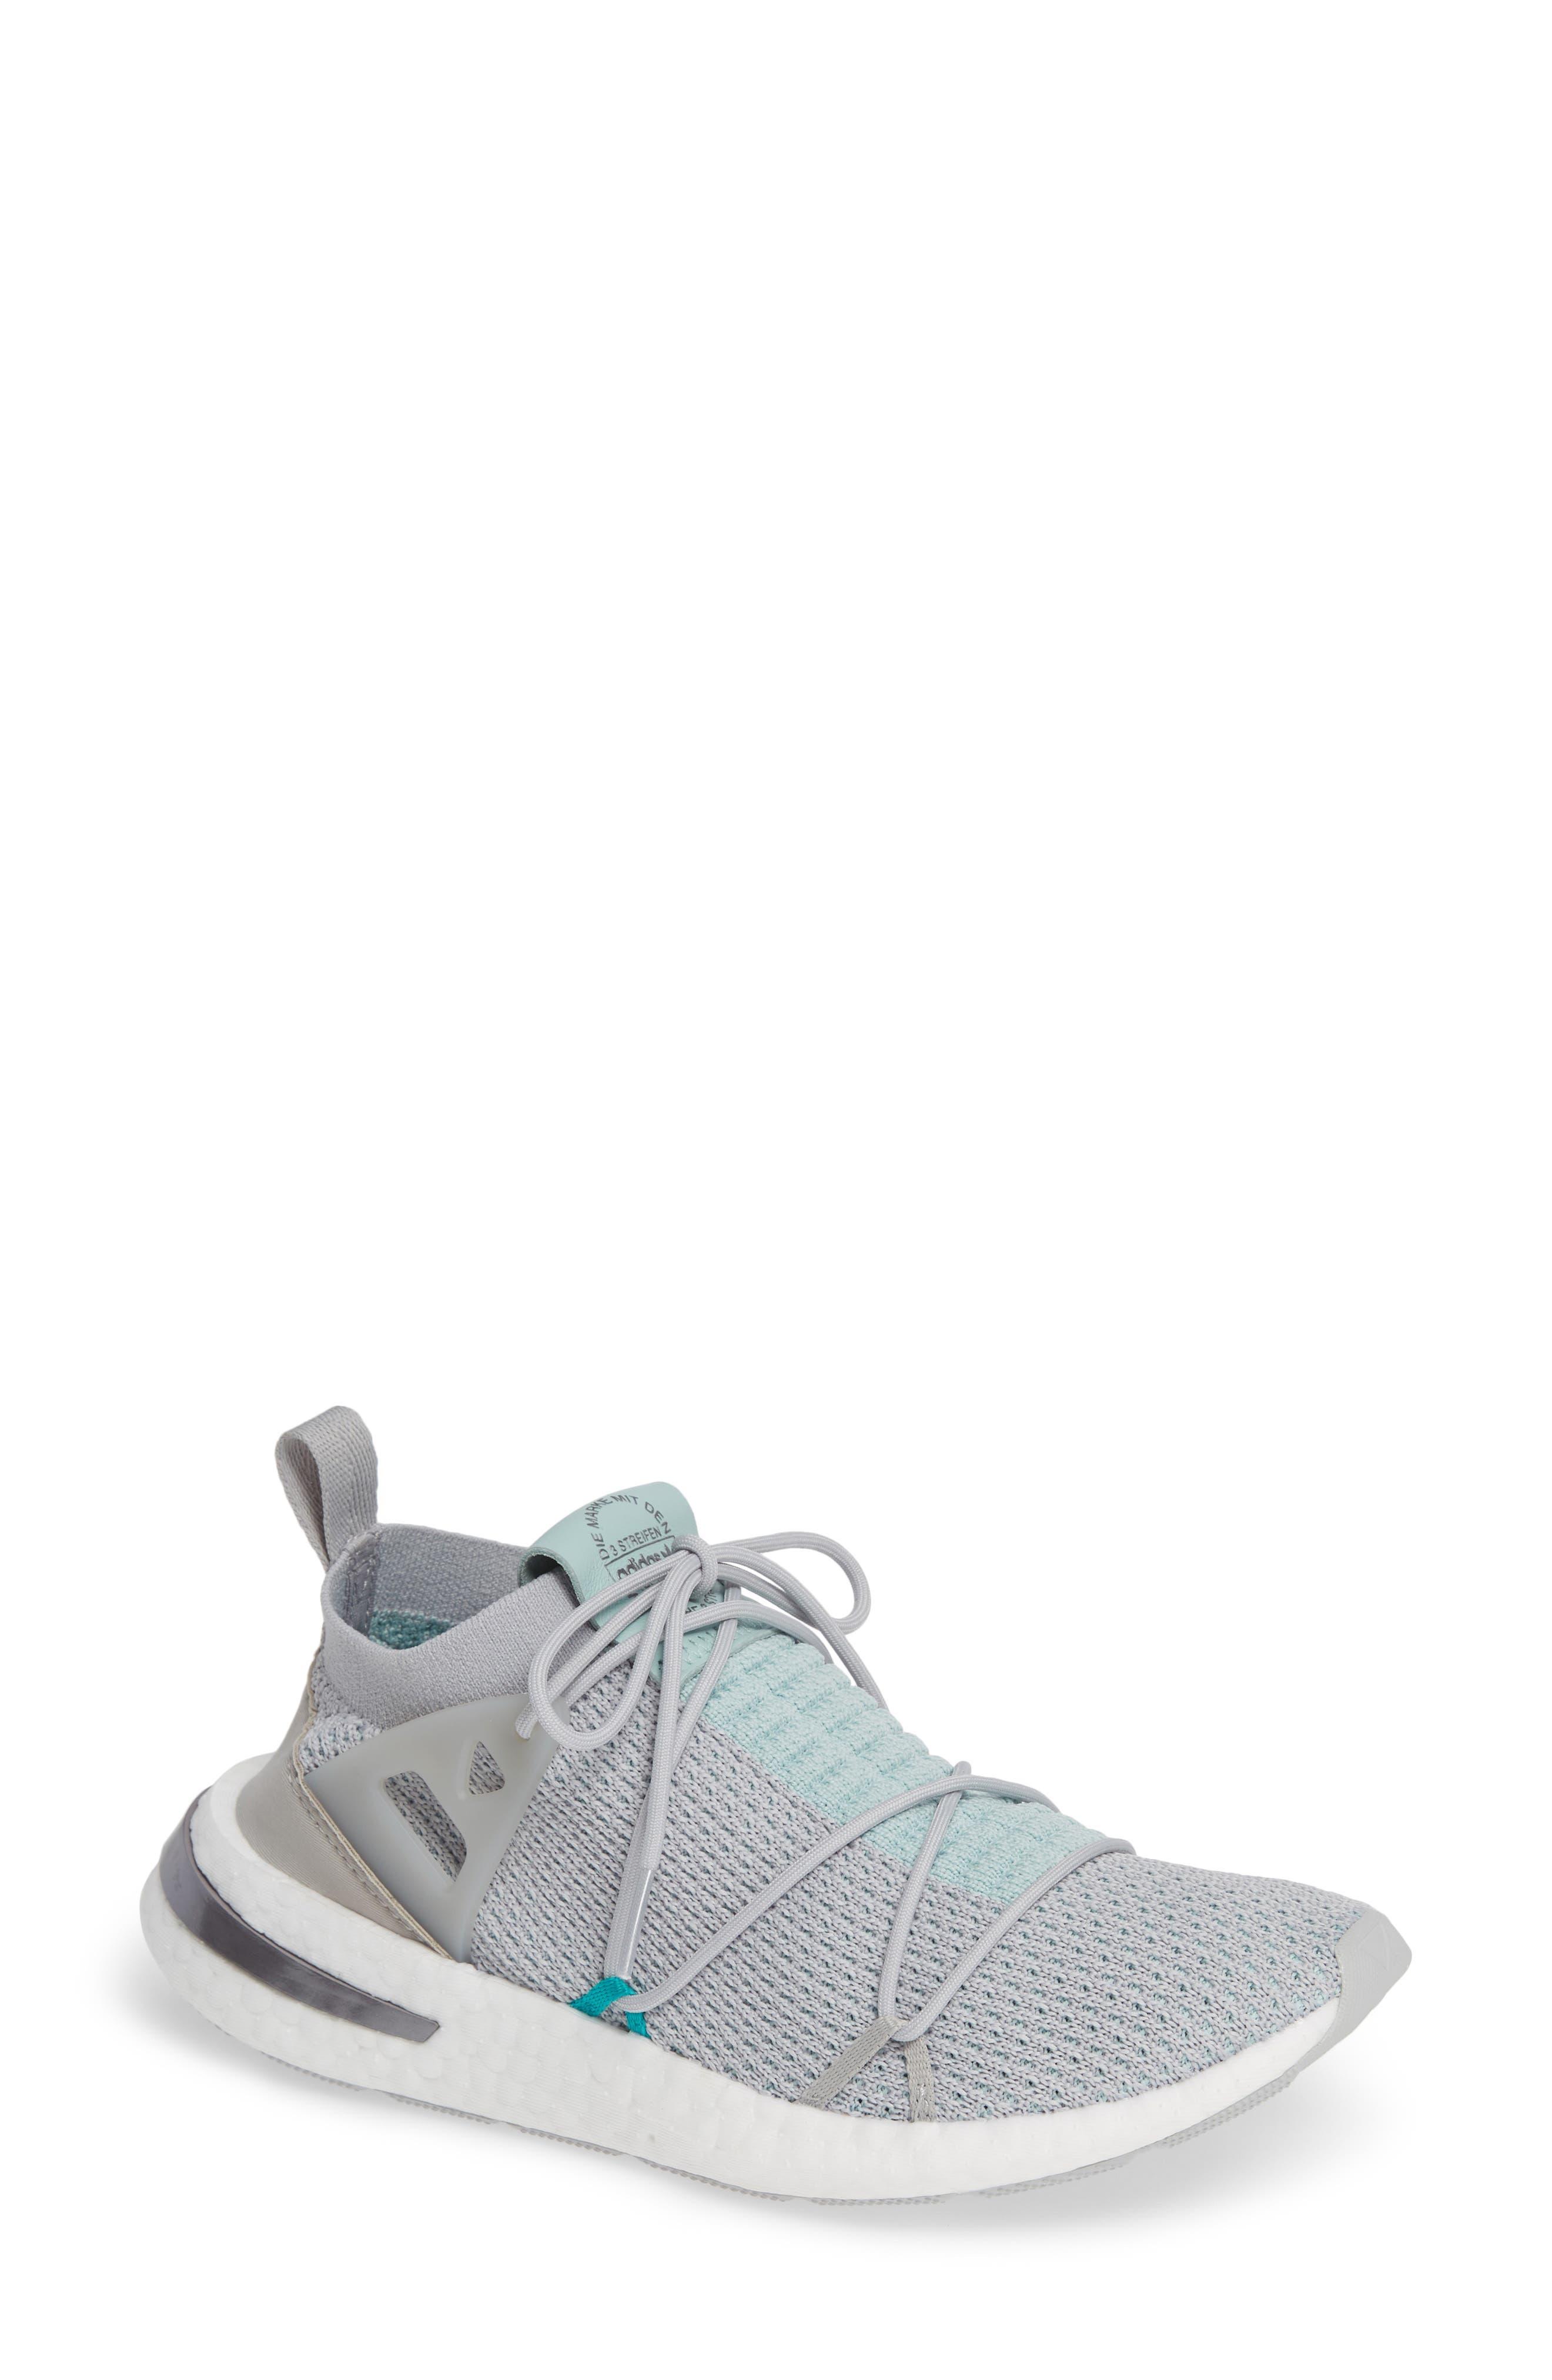 Arkyn Primeknit Sneaker,                         Main,                         color, GREY TWO/ GREY TWO/ ASH GREEN